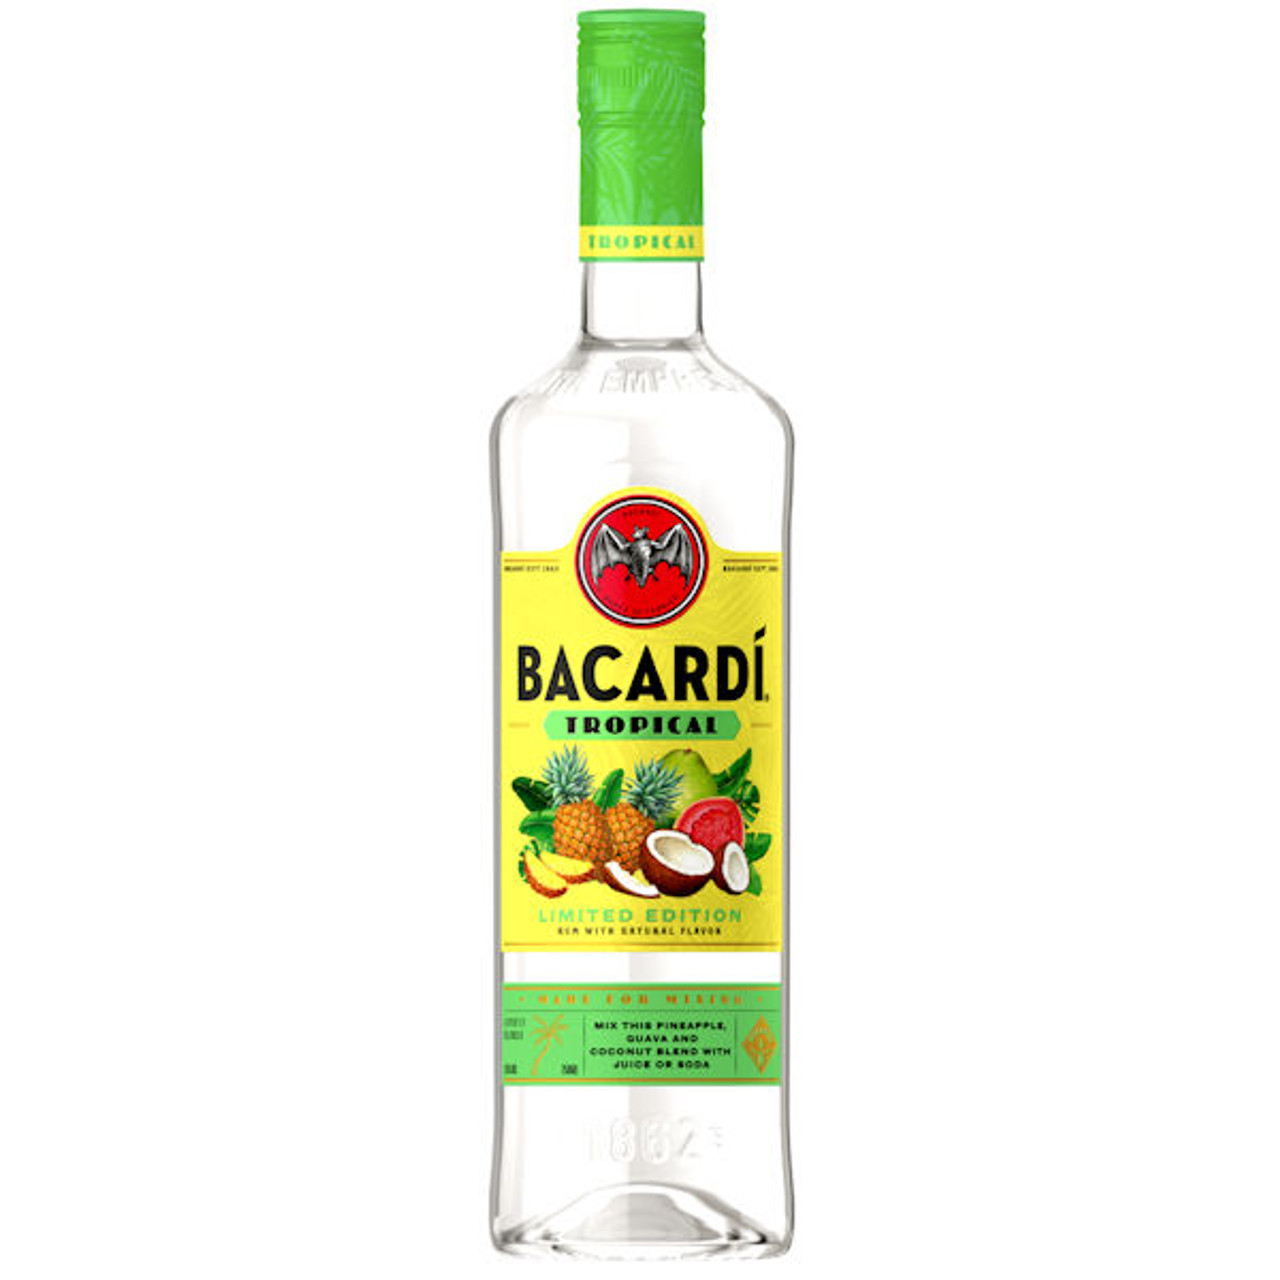 Bacardi Tropical Rum 750ml